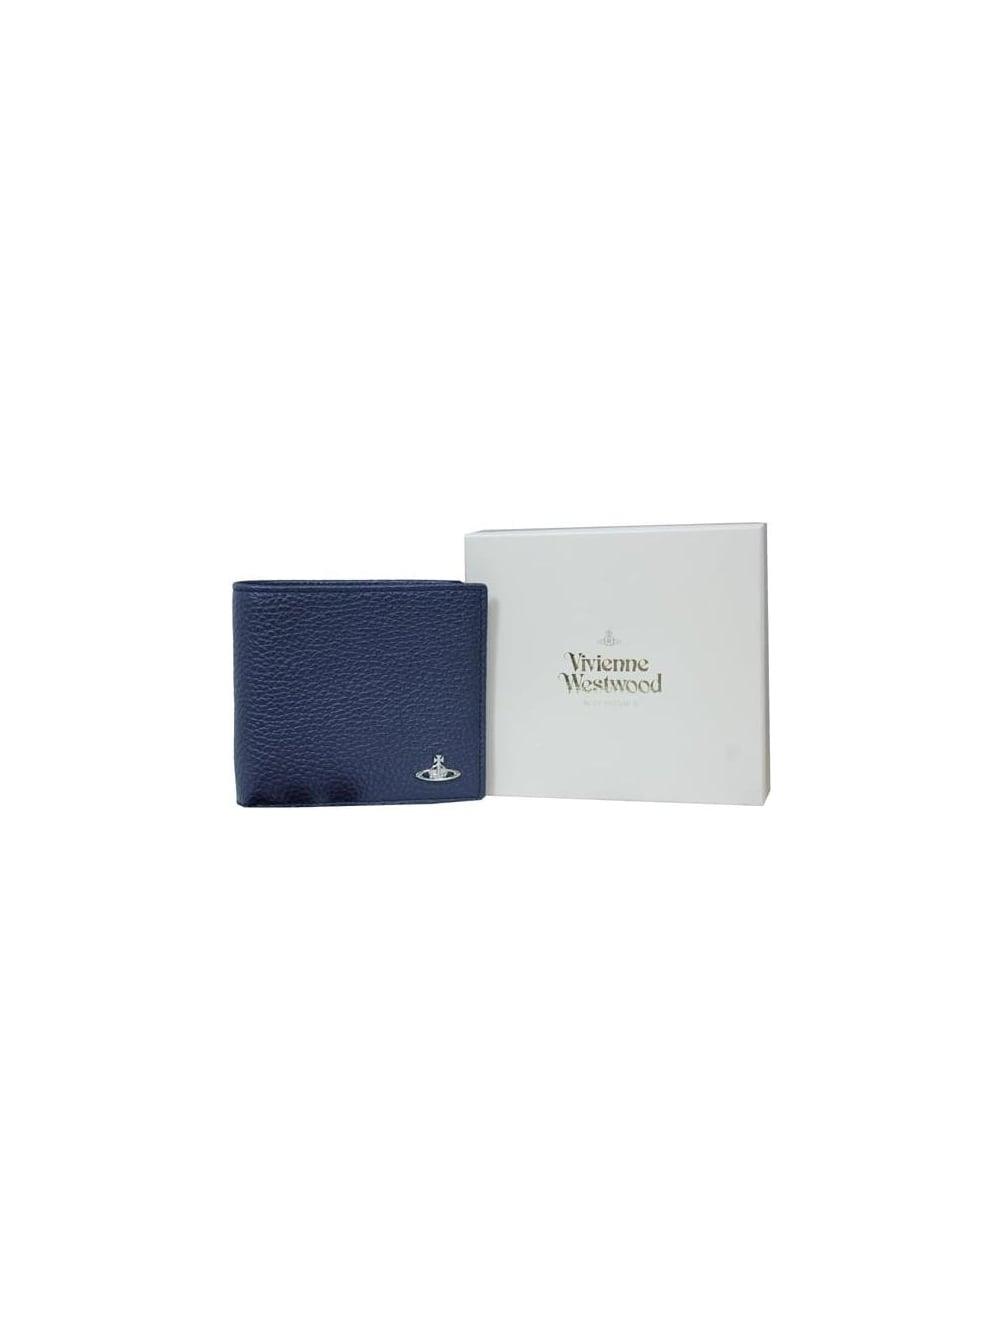 e38074c16c7 Vivienne Westwood Milano Wallet & Coin Holder in Blue - Northern Threads